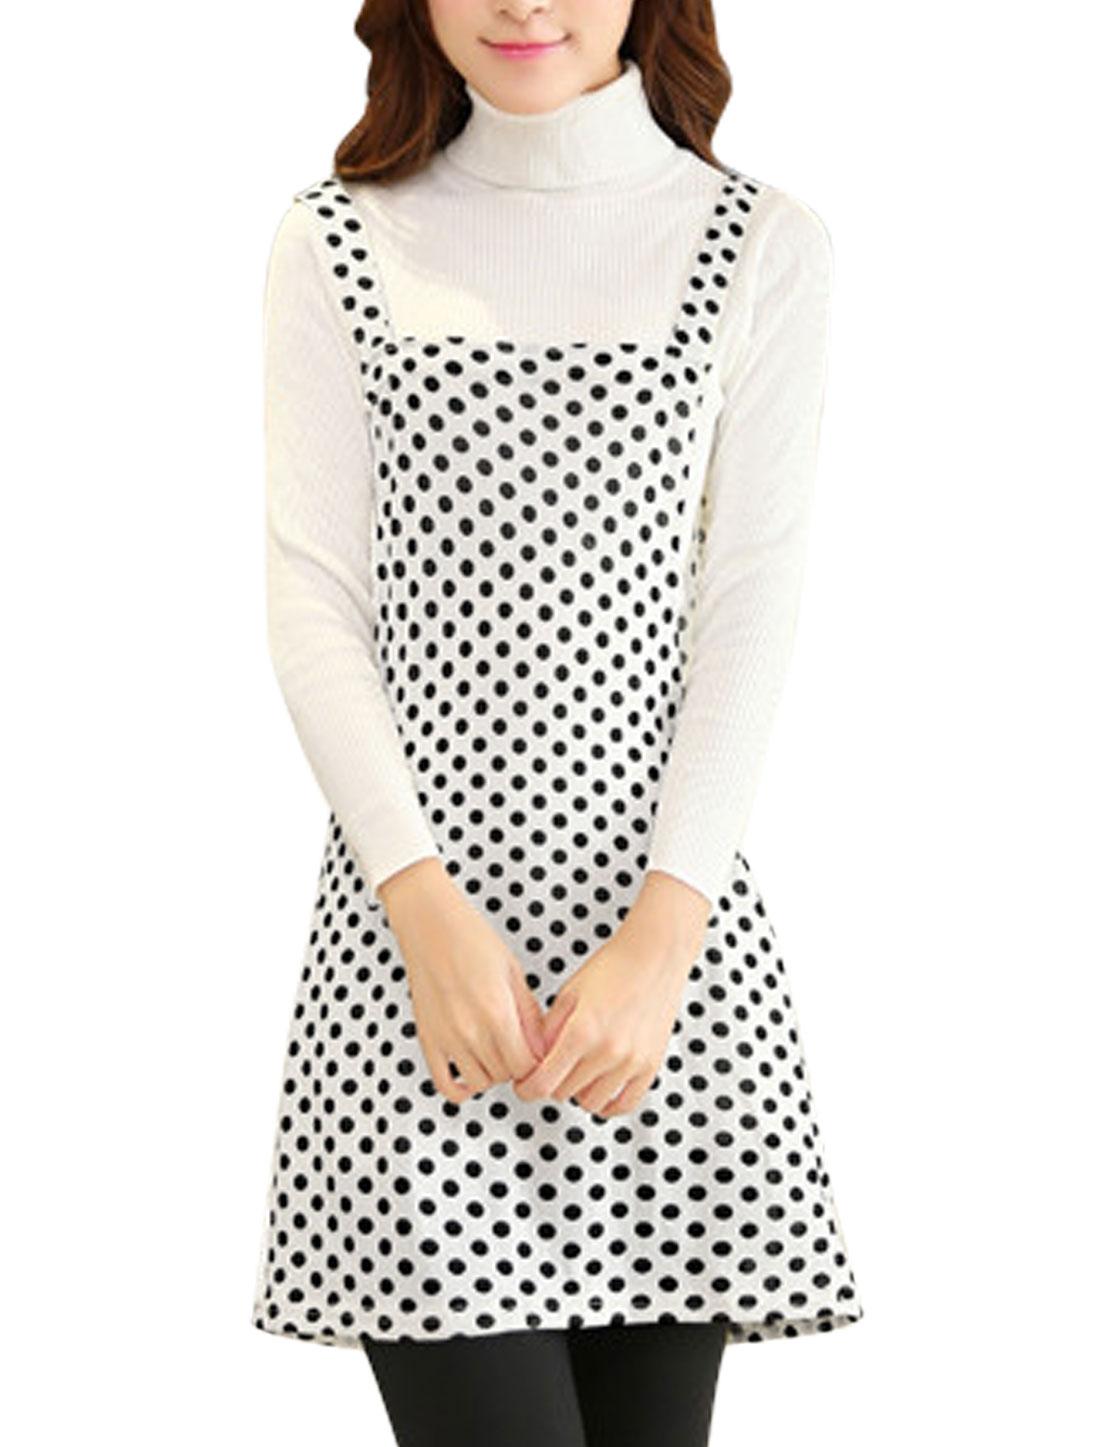 Lady Shoulder Straps Polka Dots Print Straight Knit Suspender Dress White M